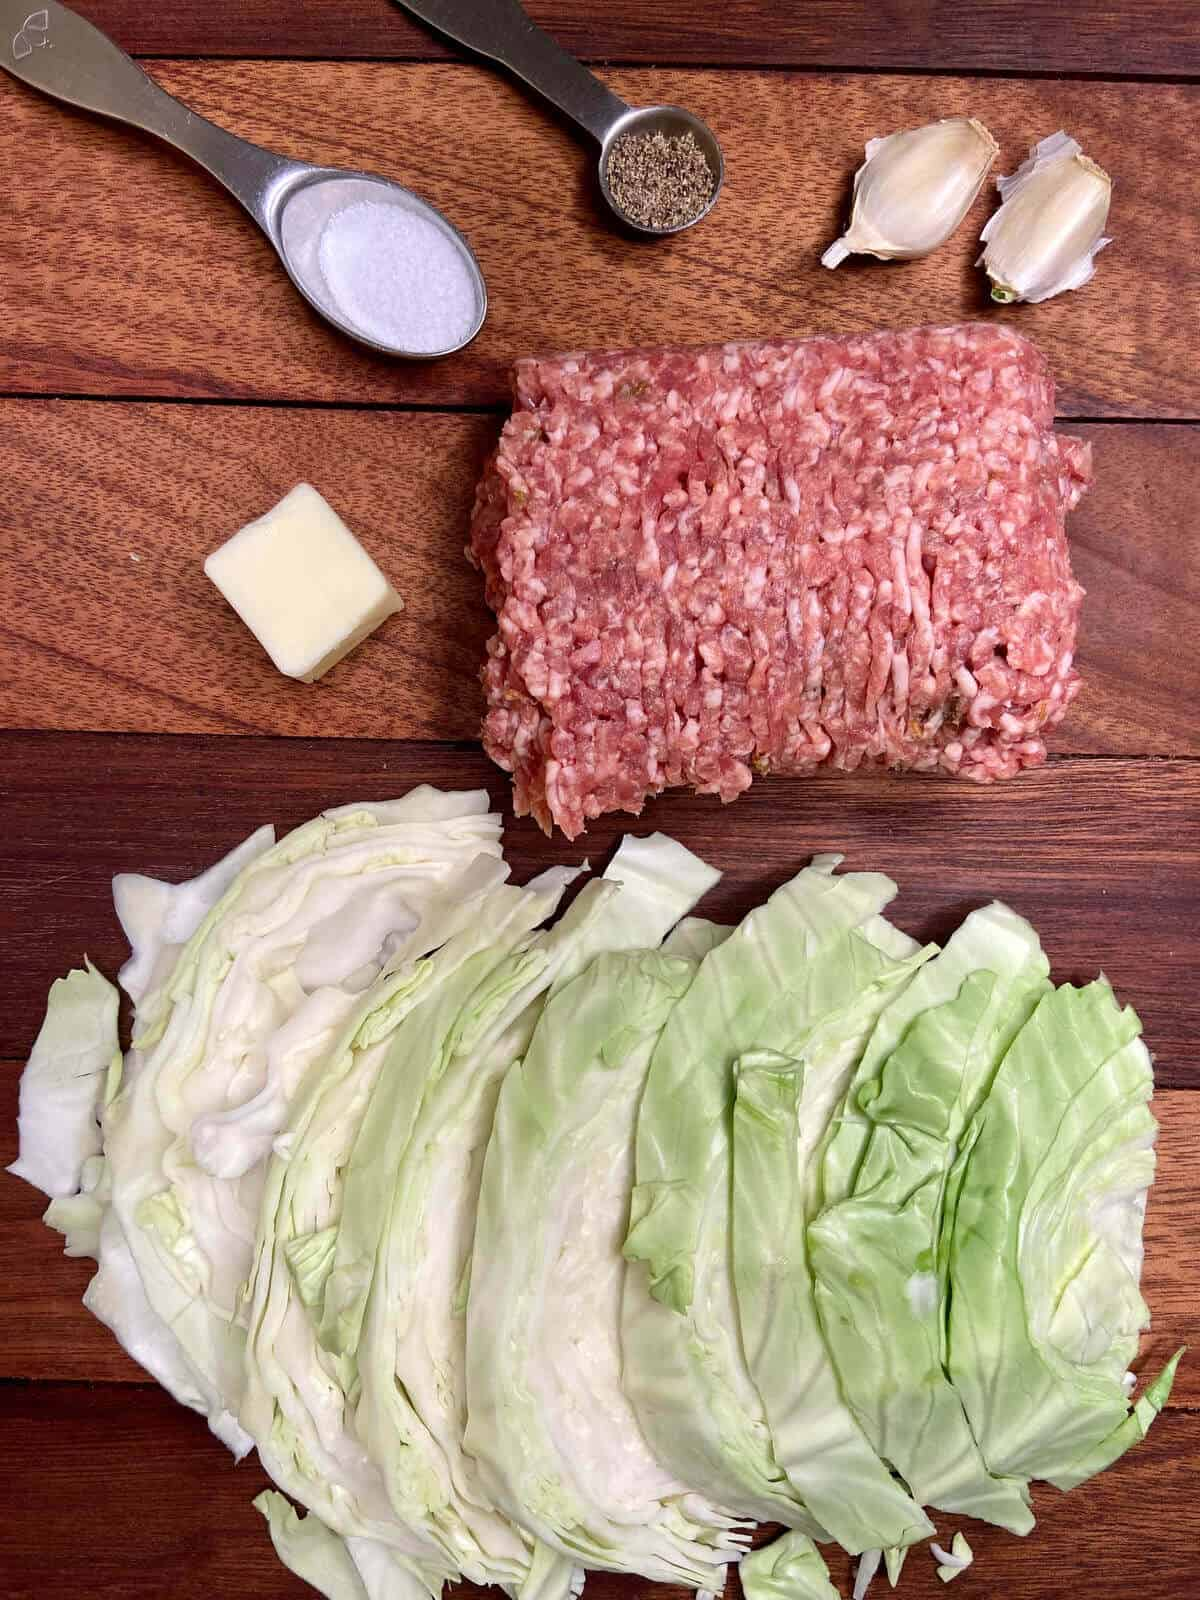 Cabbage and Sausage Casserole Recipe (Photo by Erich Boenzli)